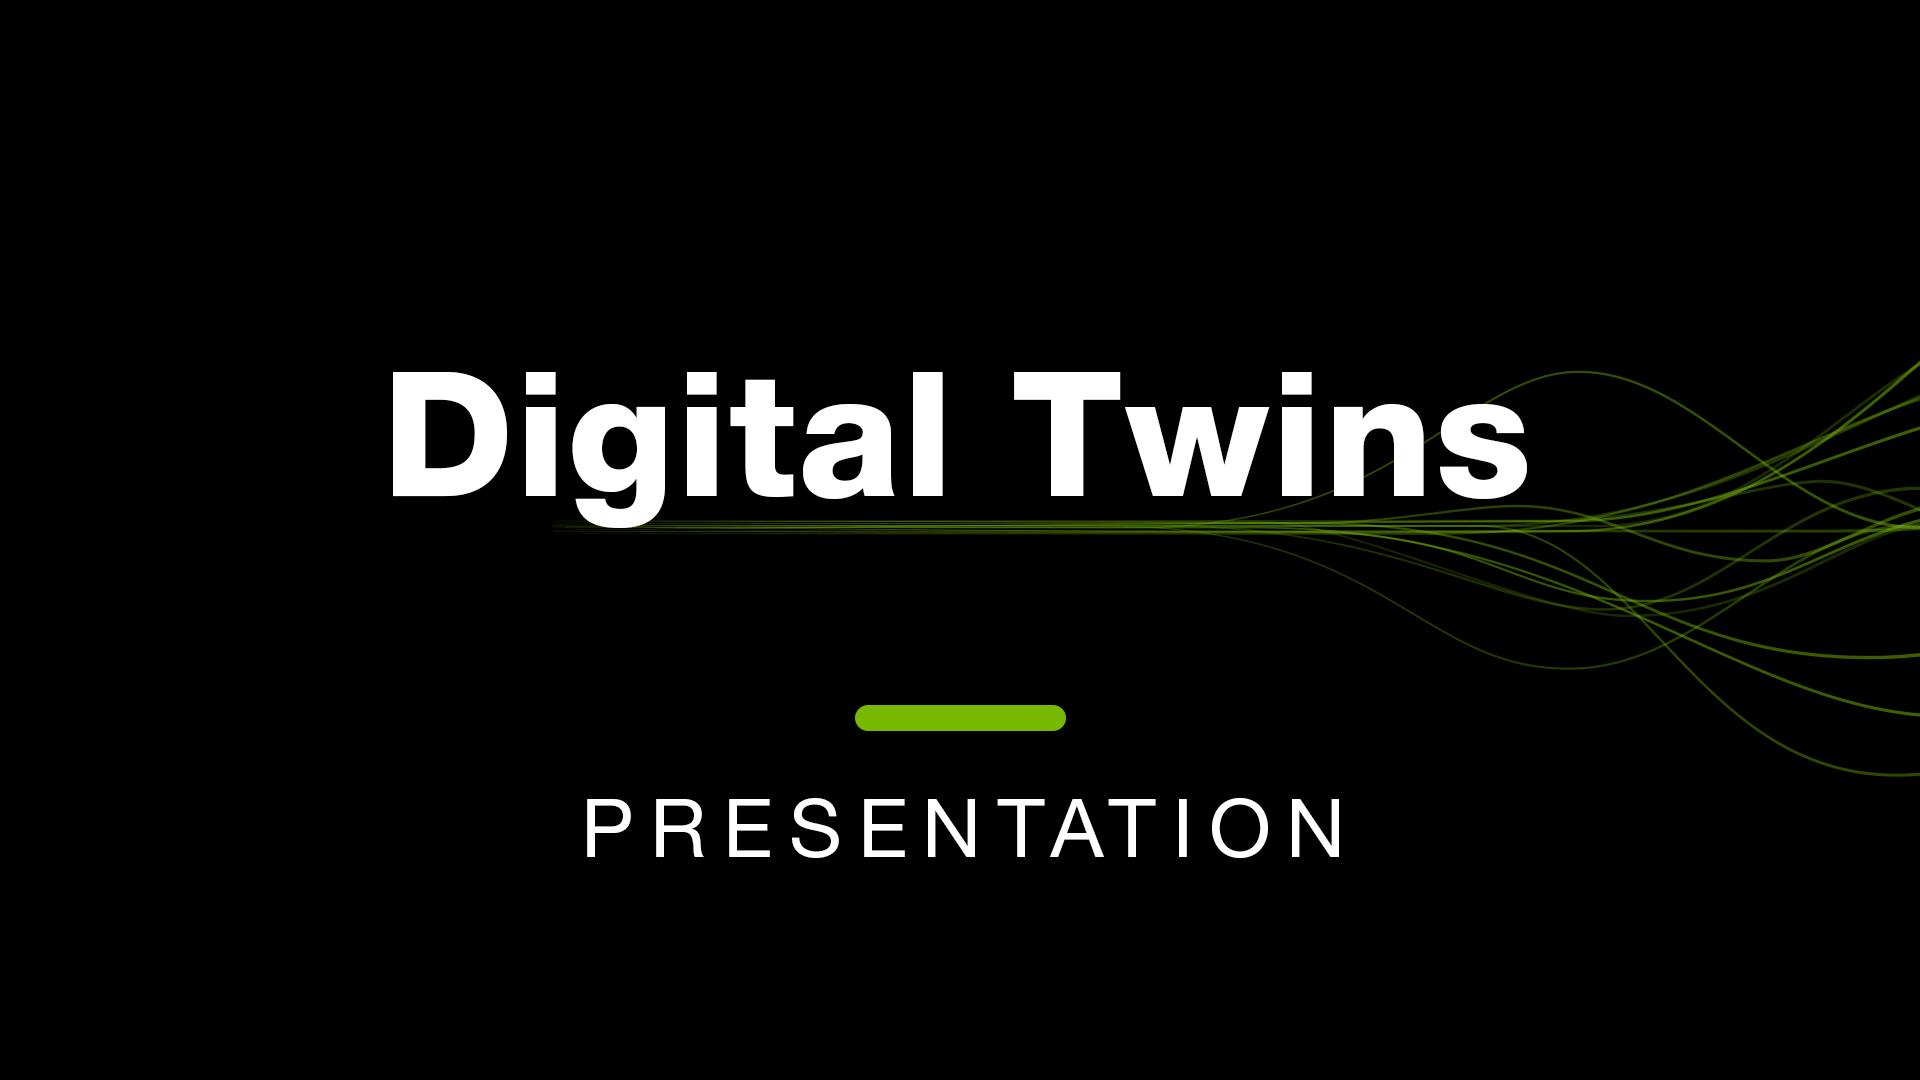 NVIDIA Digital Twins Presentation